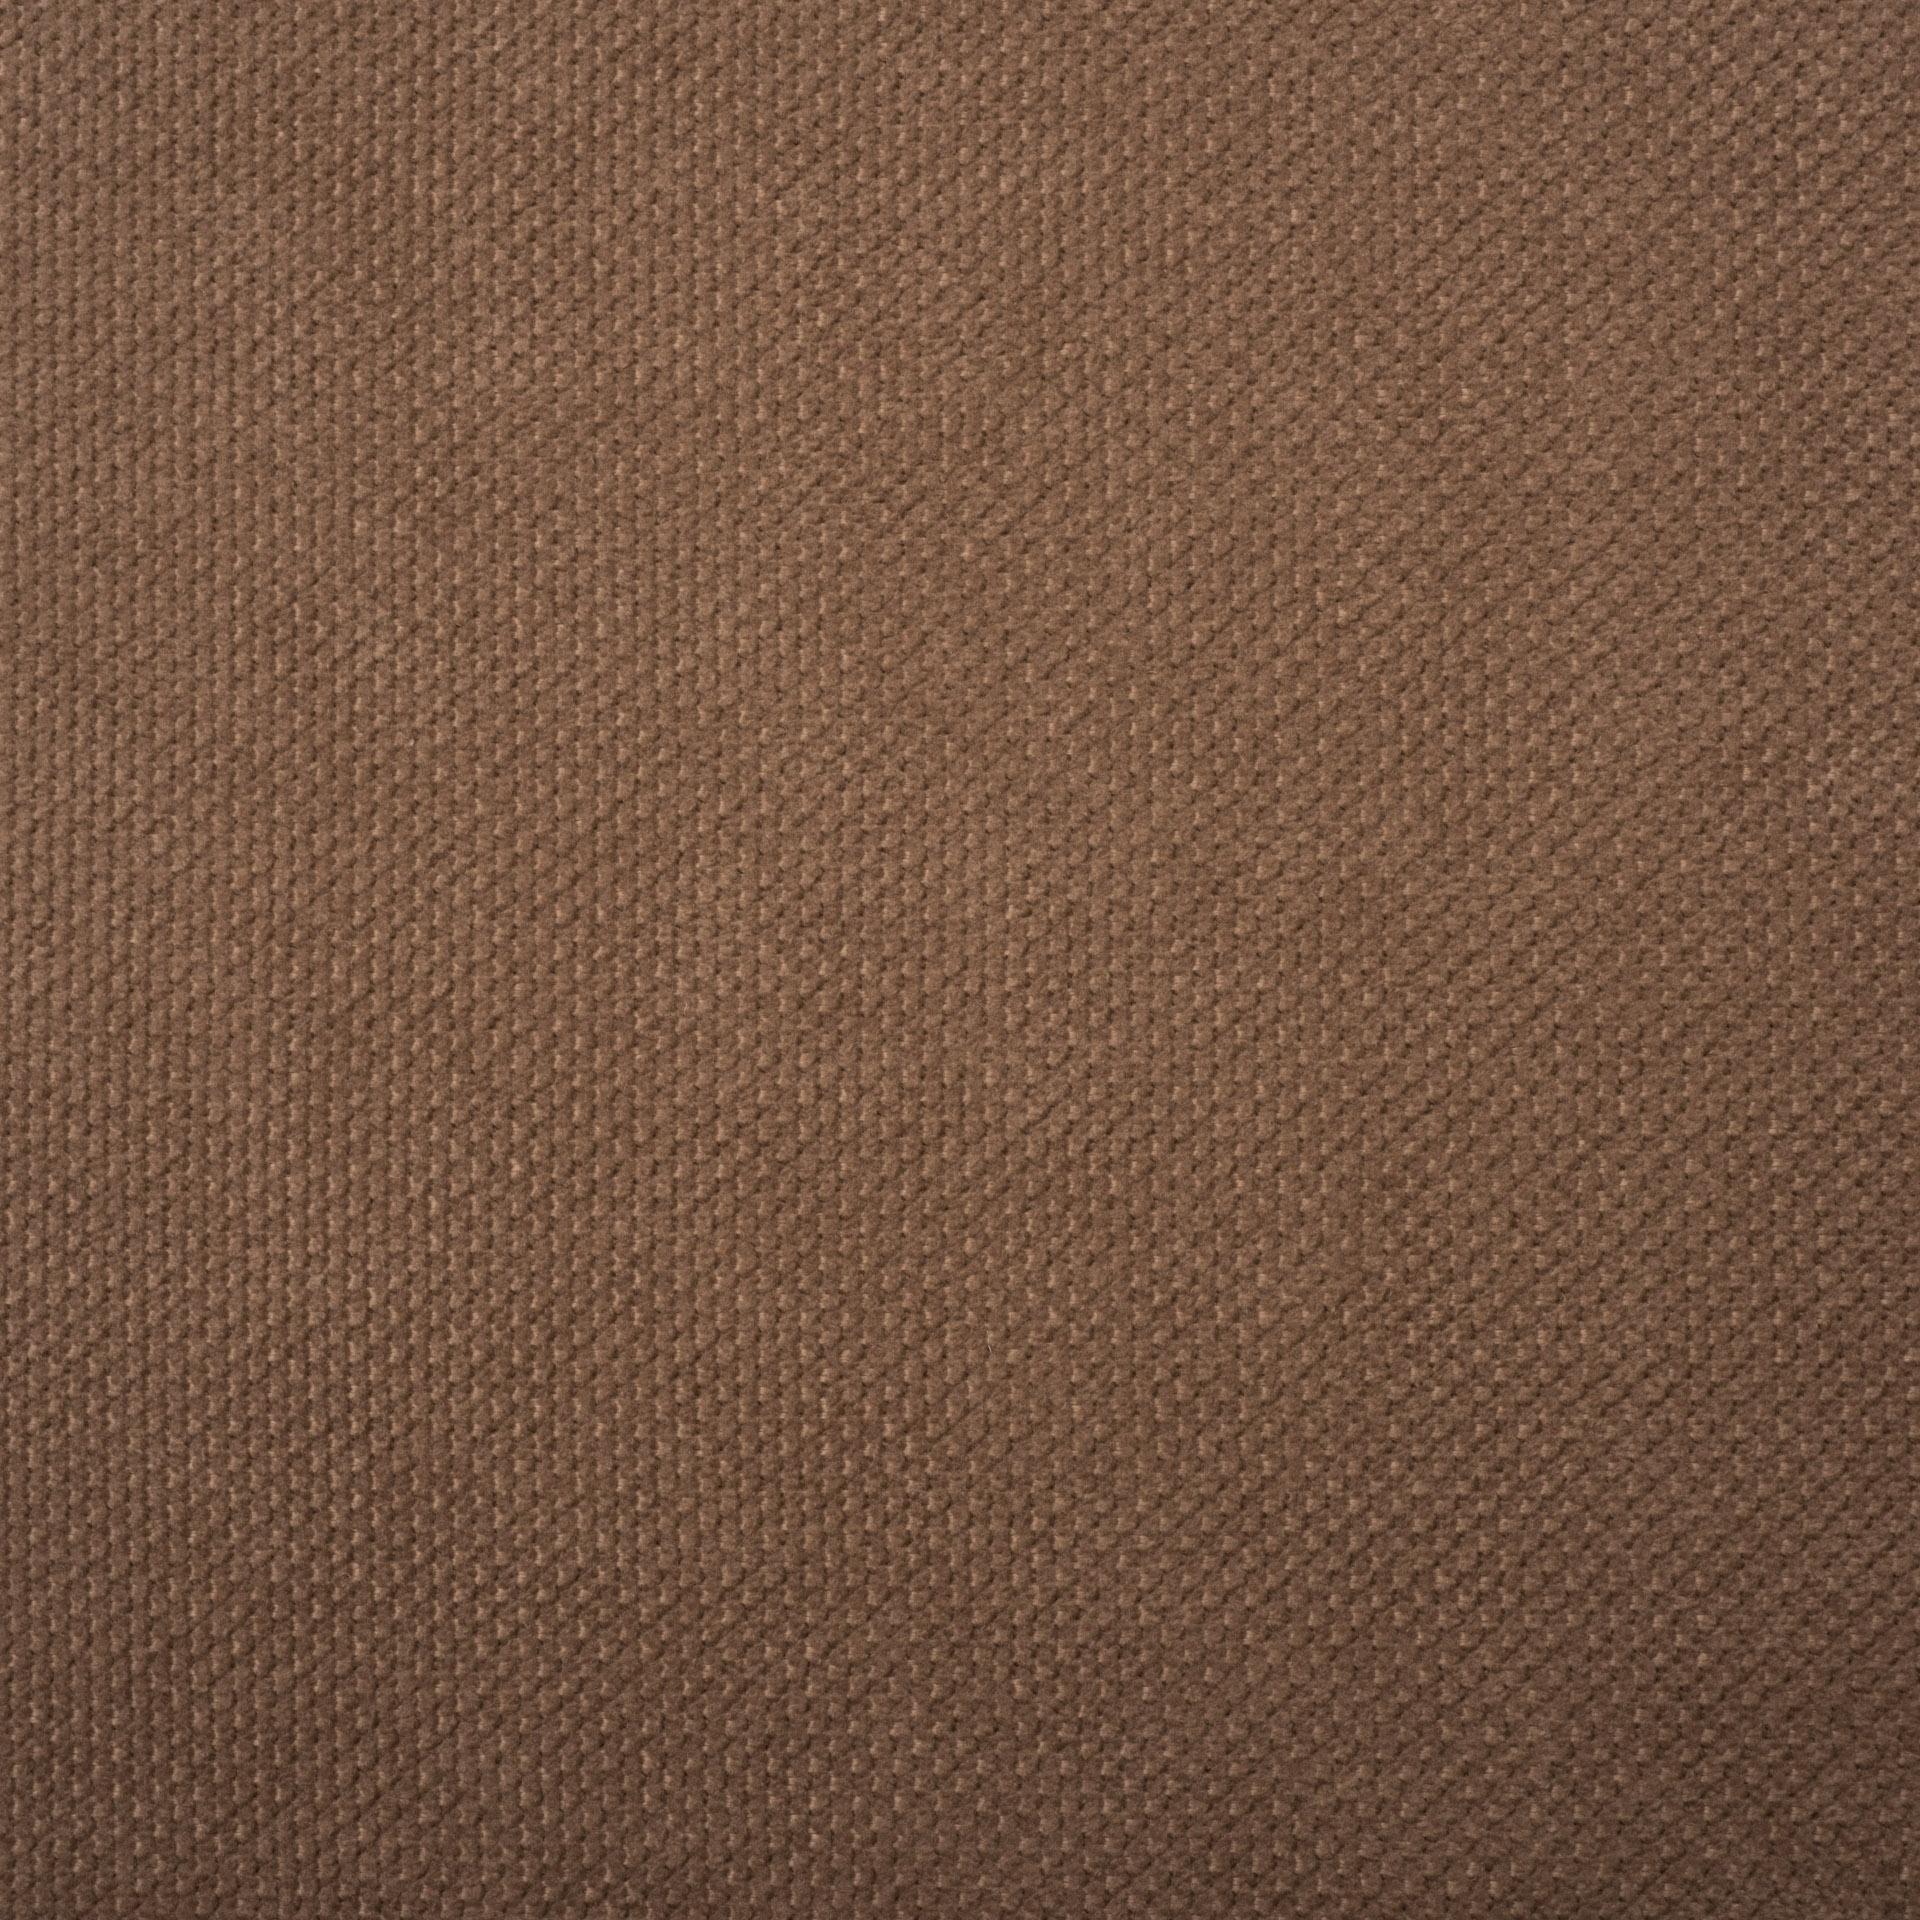 Коллекция ткани Дели 04 CAPPUCHINO,  купить ткань Жаккард для мебели Украина